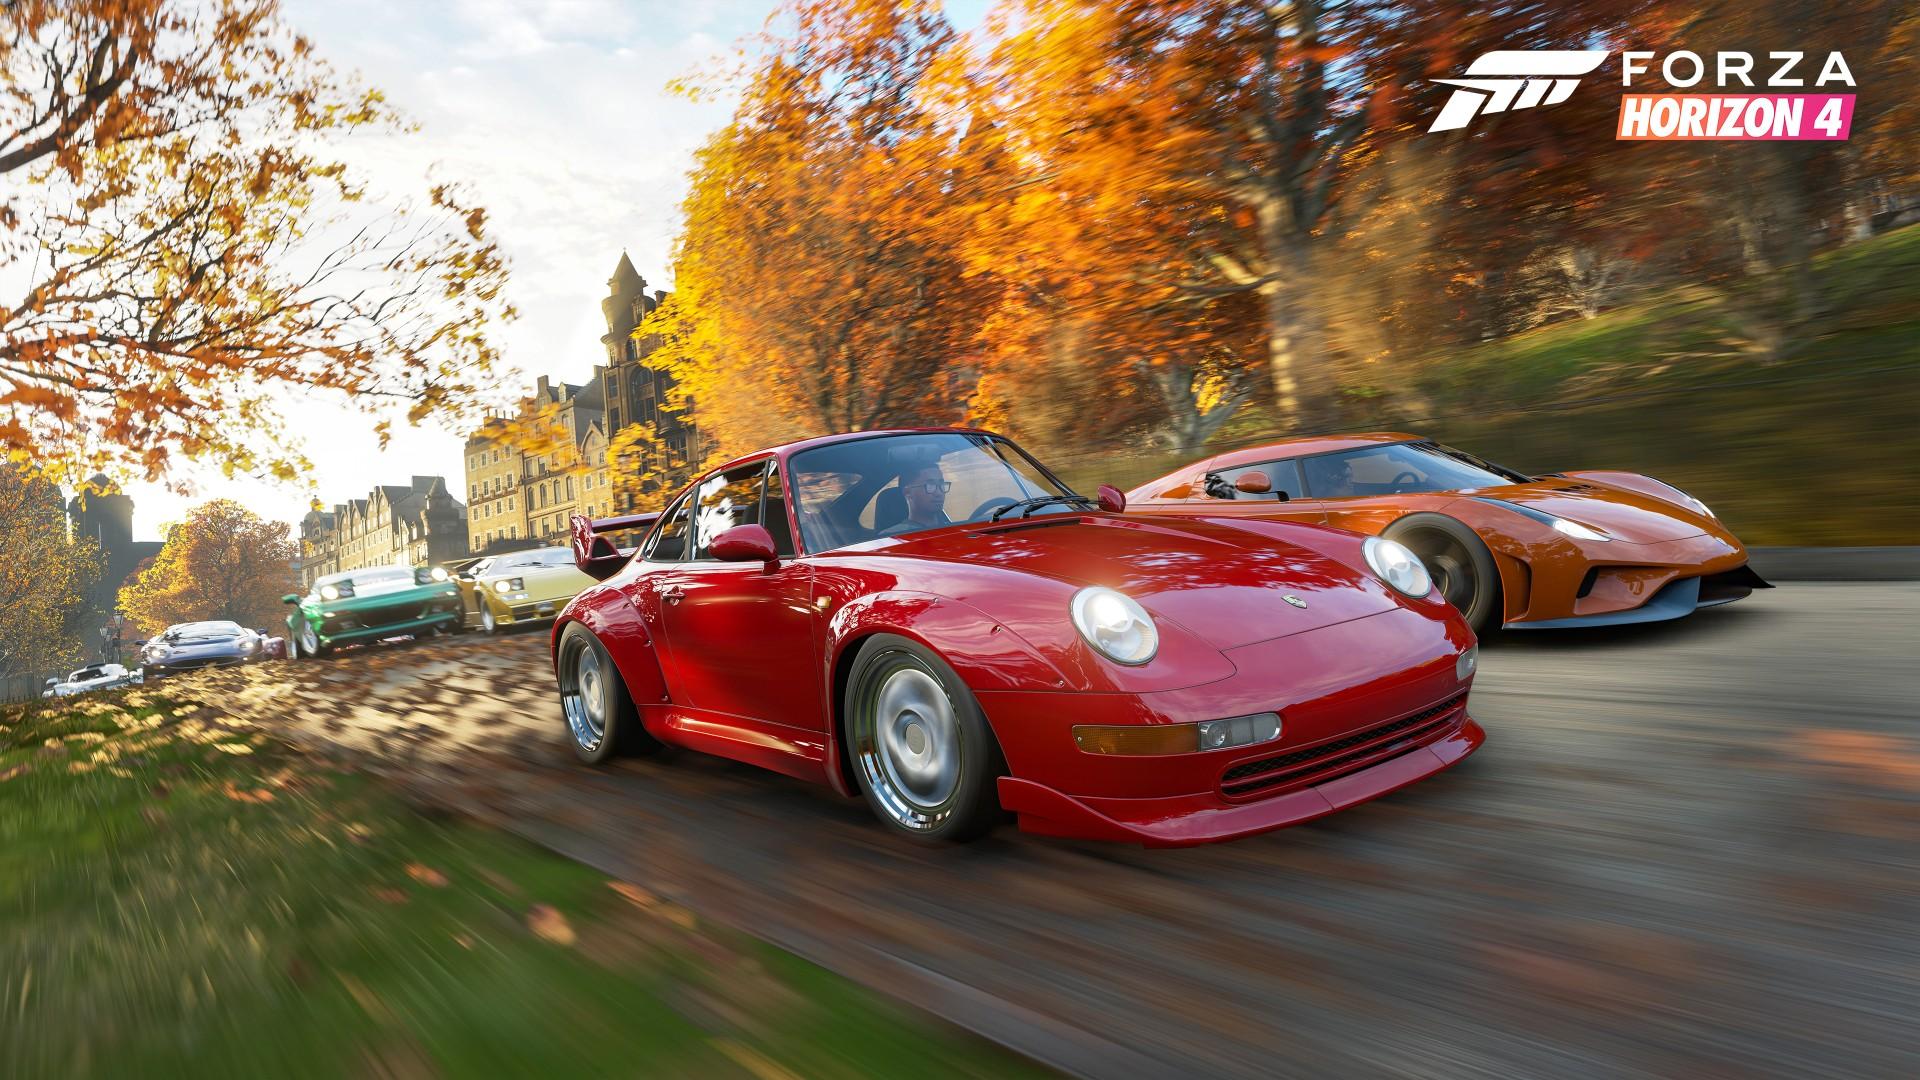 Forza Horizon 4 demo stuck at loading screen Forza-Horizon-4_Autumn-Drive-1.jpg